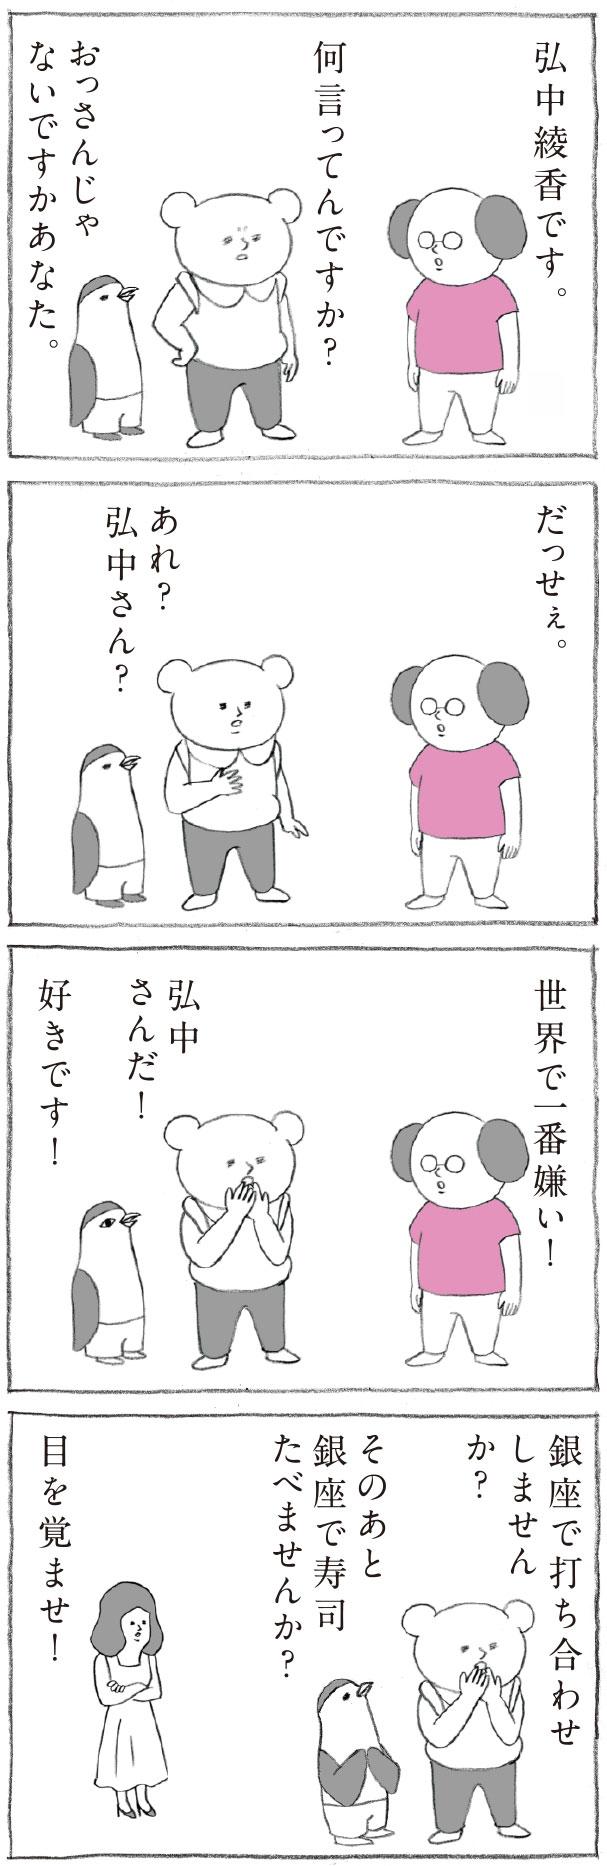 Hanako 1176号:おかわり自由